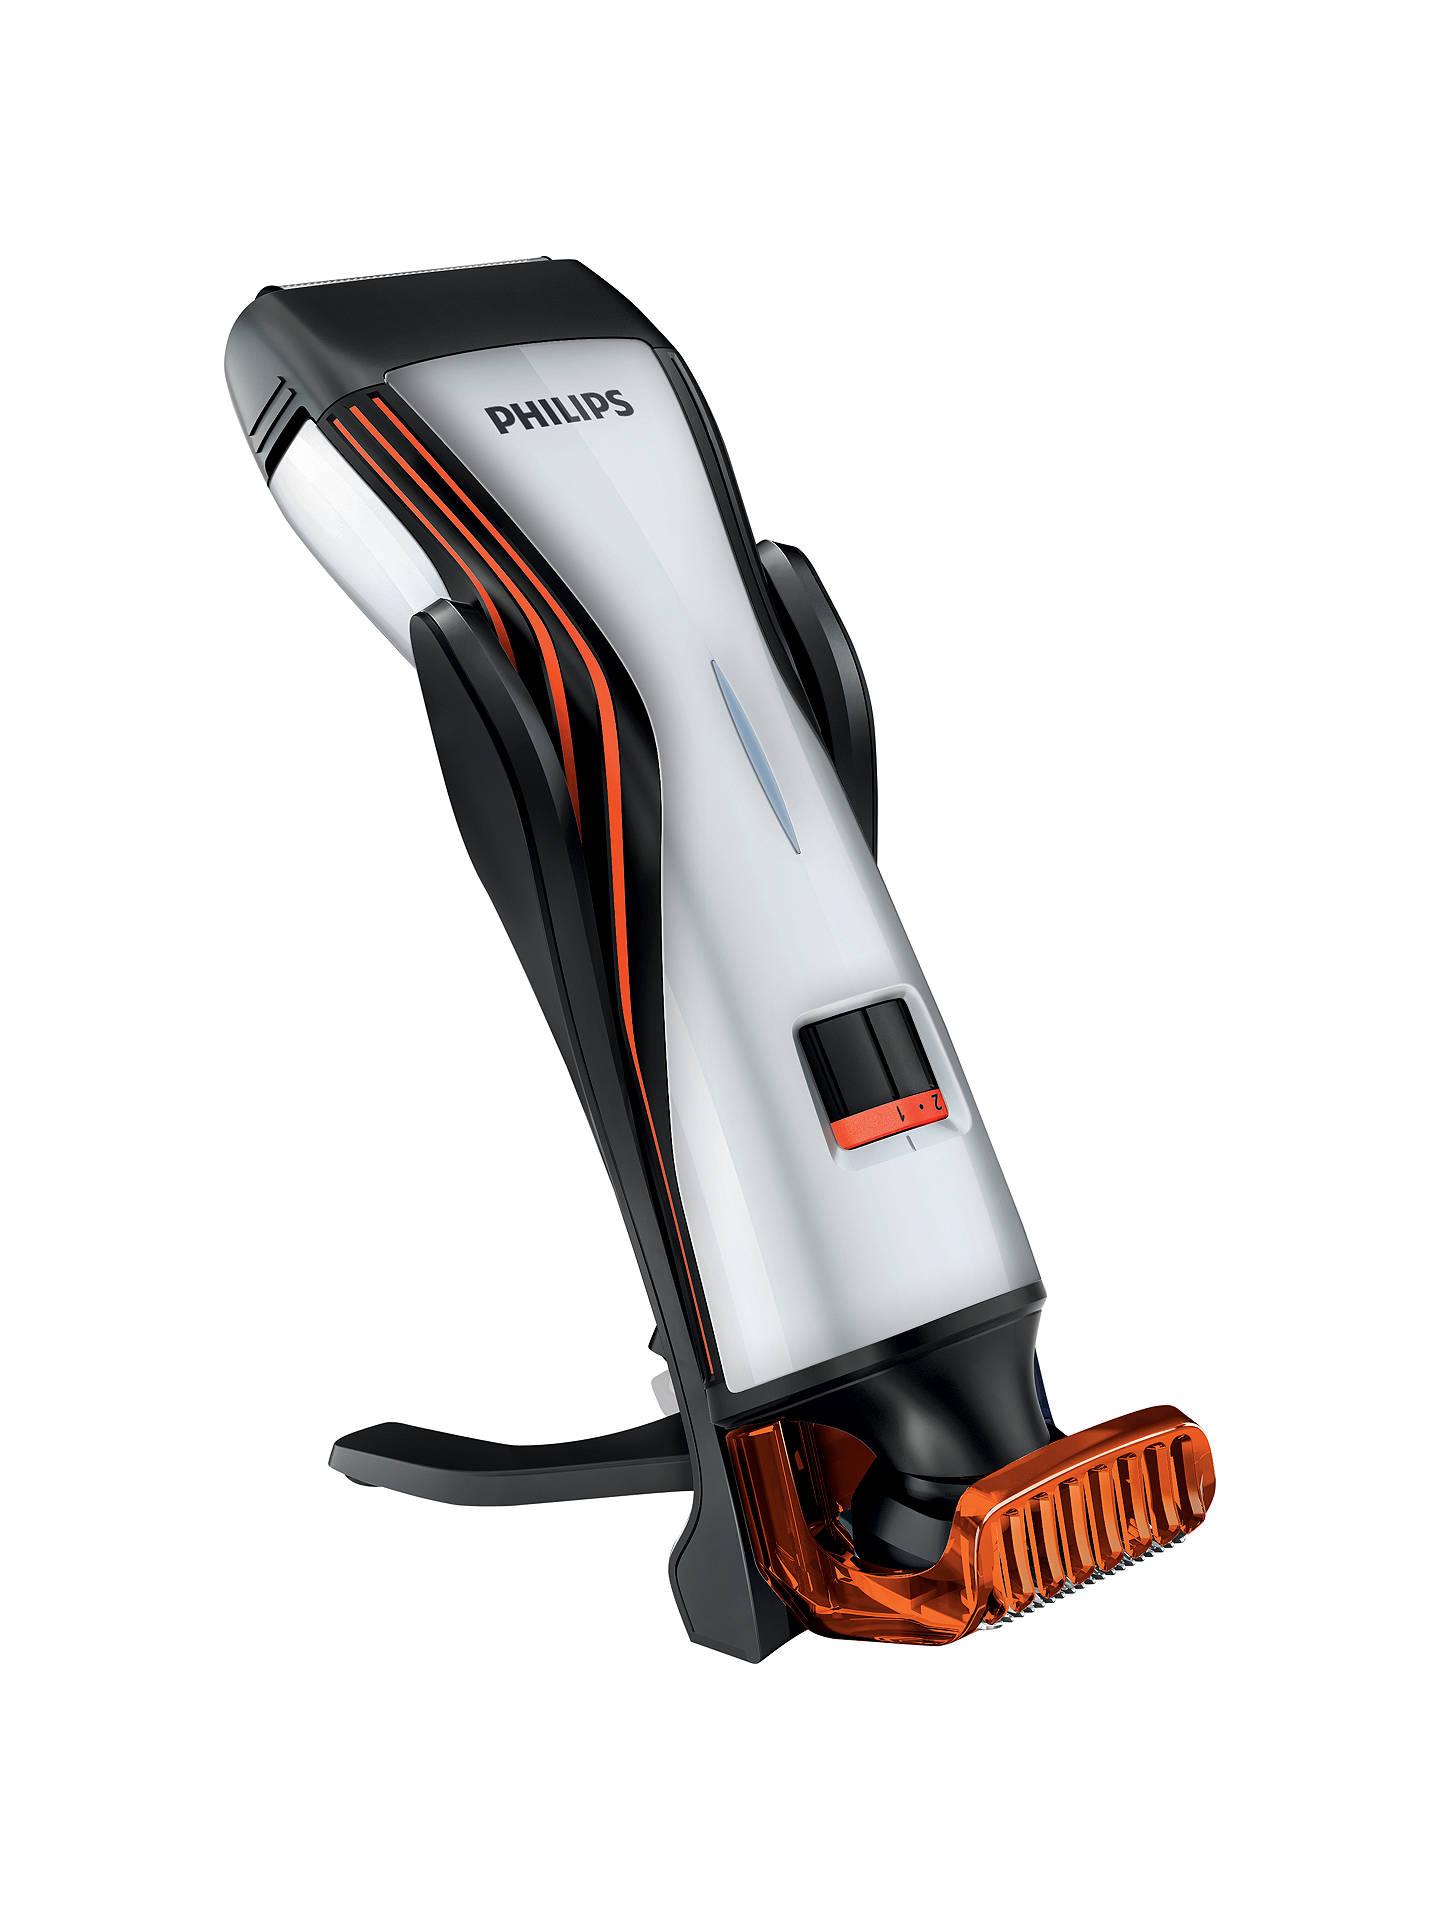 ddf4da4381a ... Buy Philips QS6140/32 Beard Styleshaver Online at johnlewis.com ...